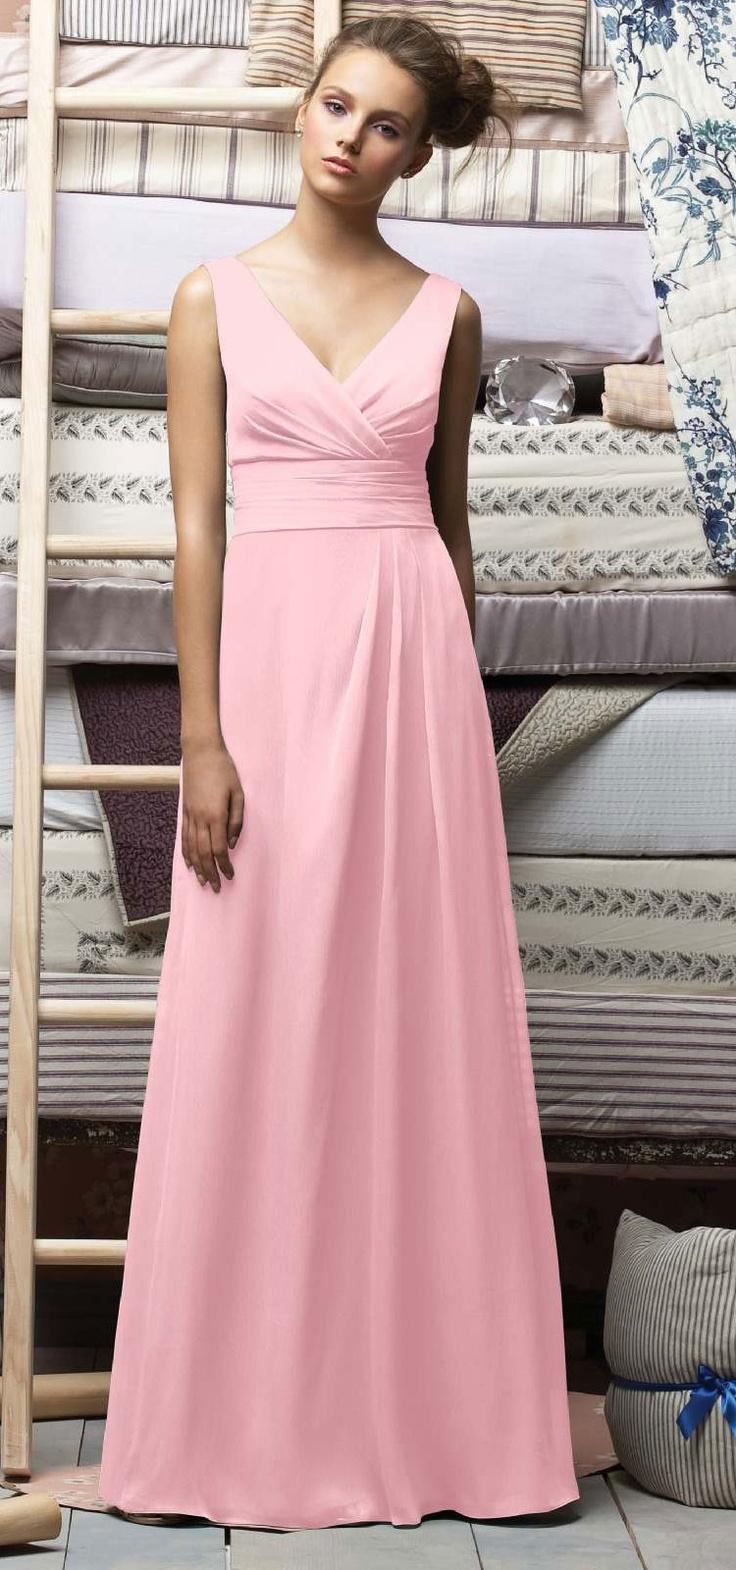 87 best Pale Pink Dresses images on Pinterest | Bridesmaids, Bridal ...